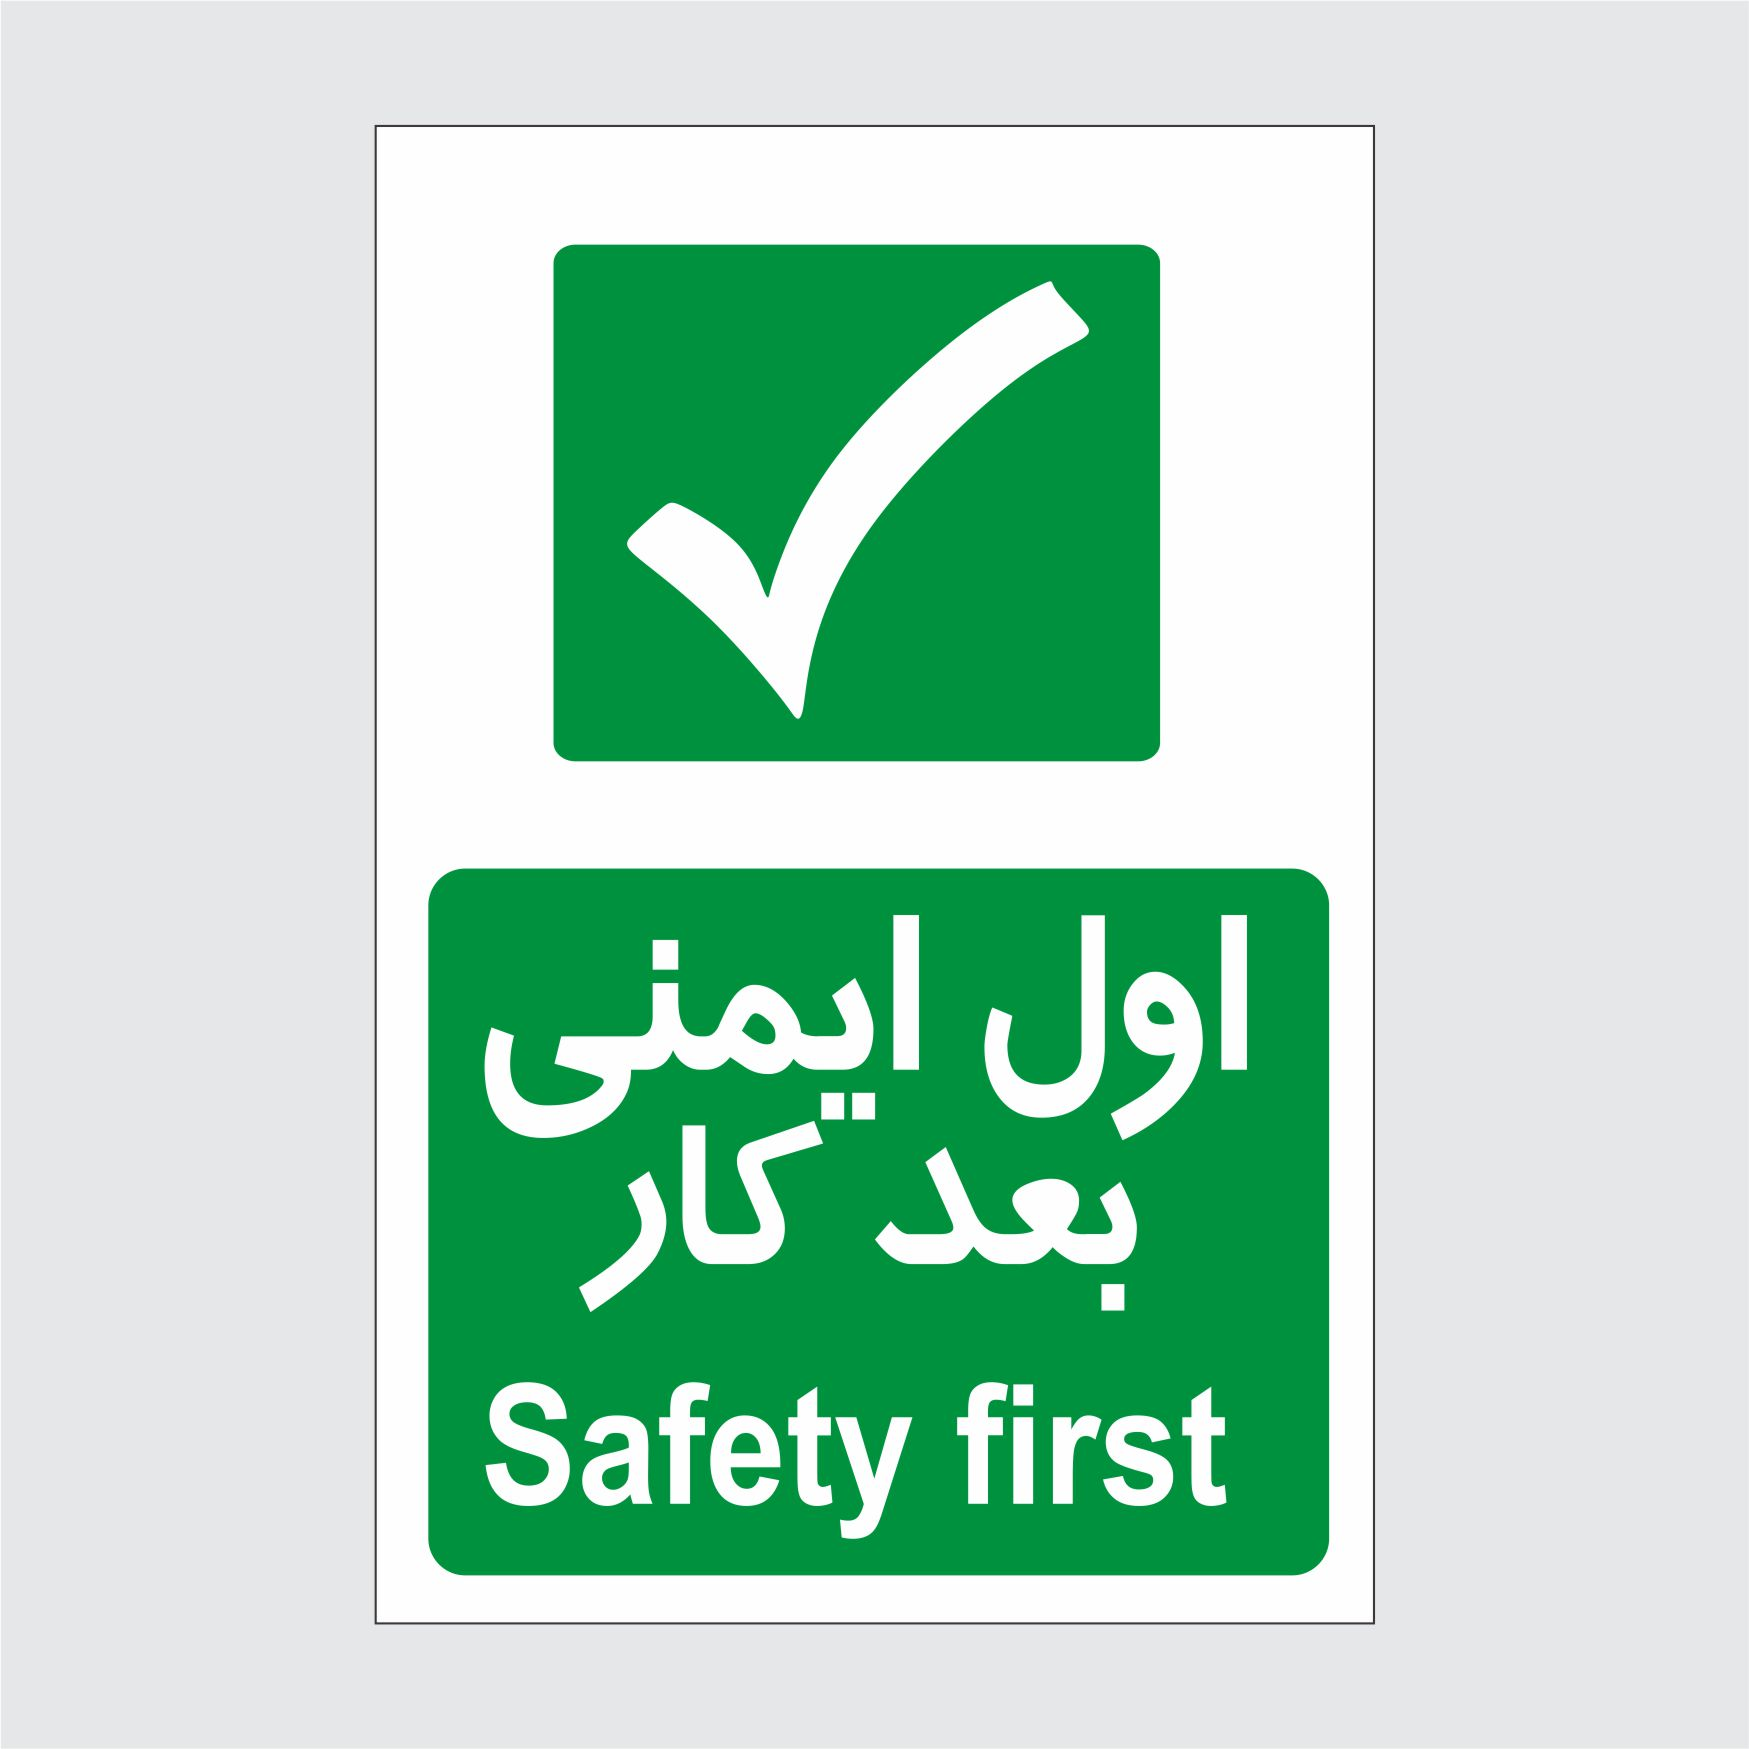 برچسب ایمنی طرح اول ایمنی بعد کار